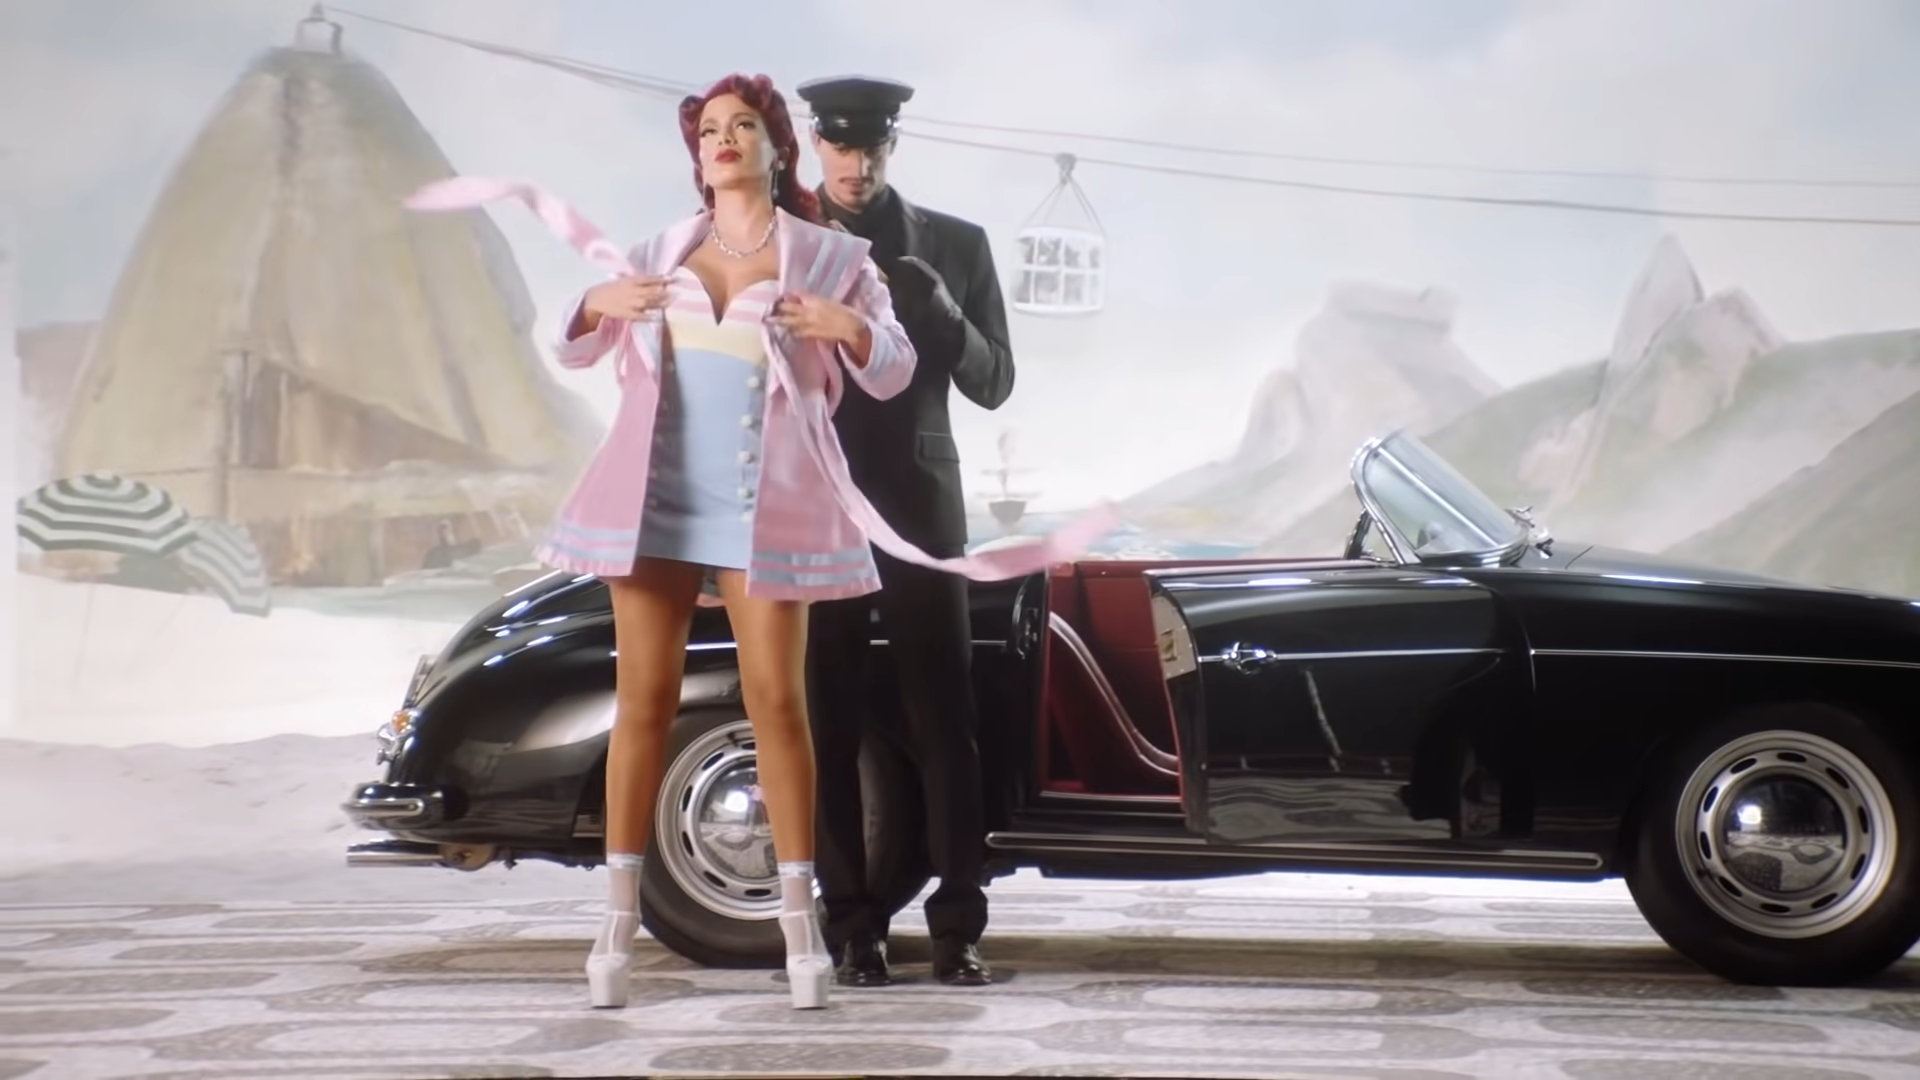 Anitta - Girl From Rio (Official Music Video) 0-13 Screenshot